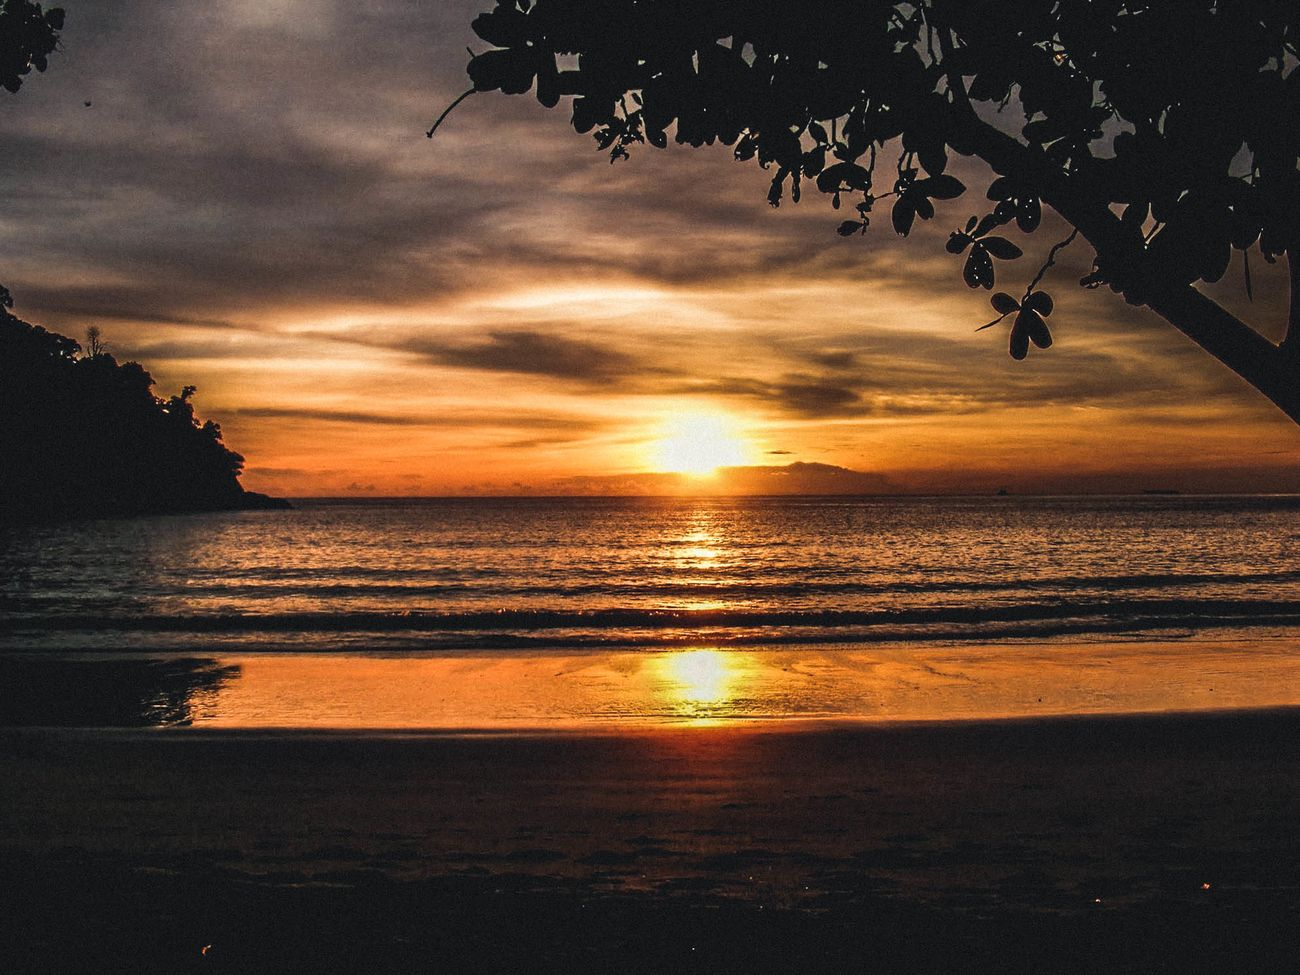 Pankor Laut